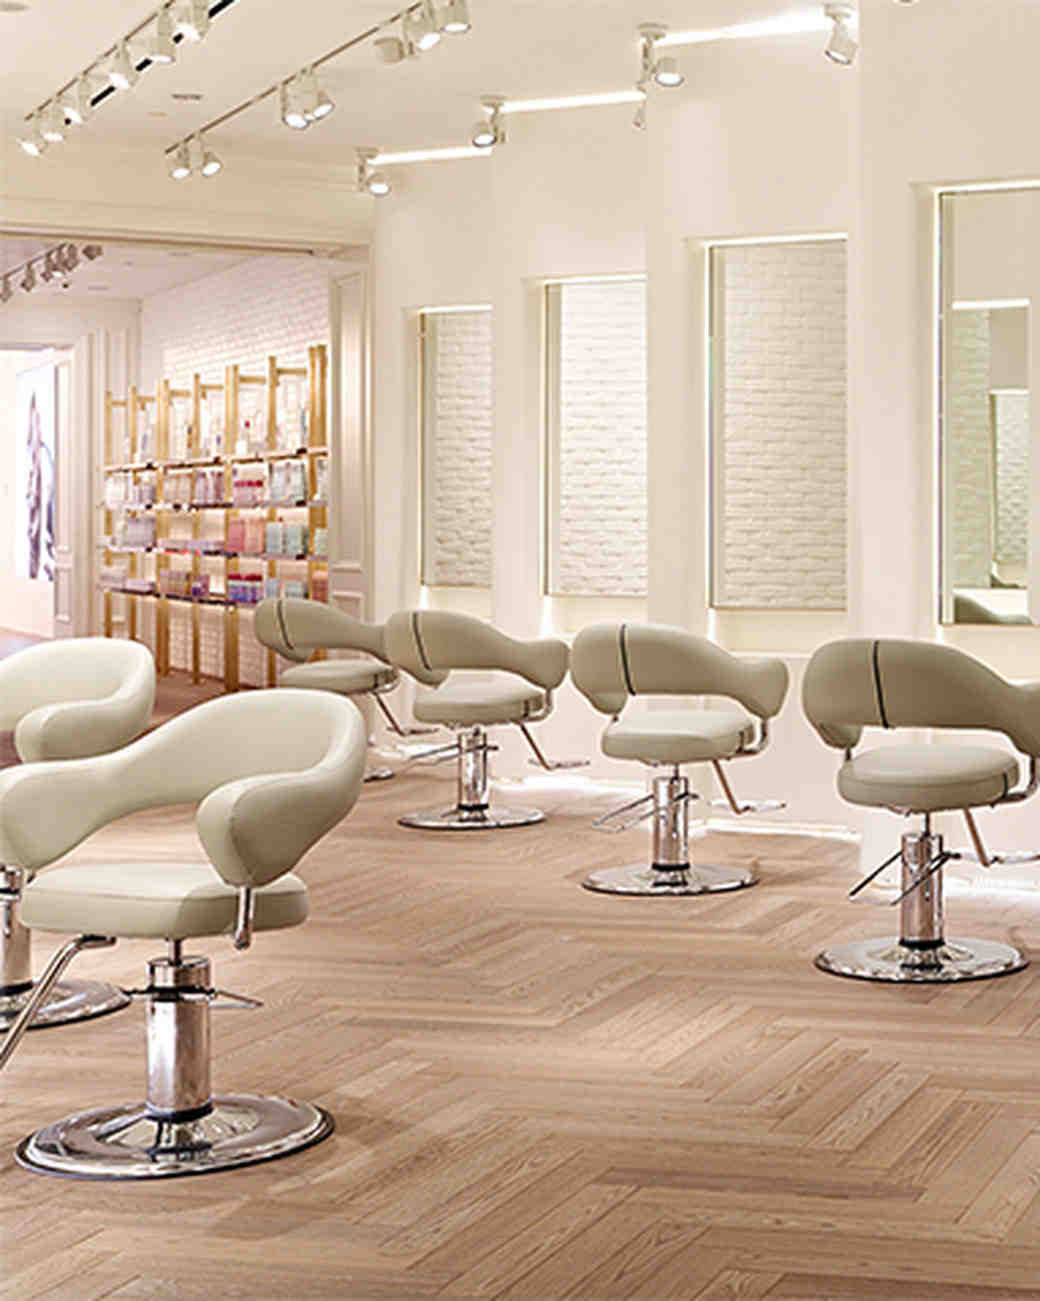 nyc-beauty-bachelorette-nexxus-salon-1115.jpg